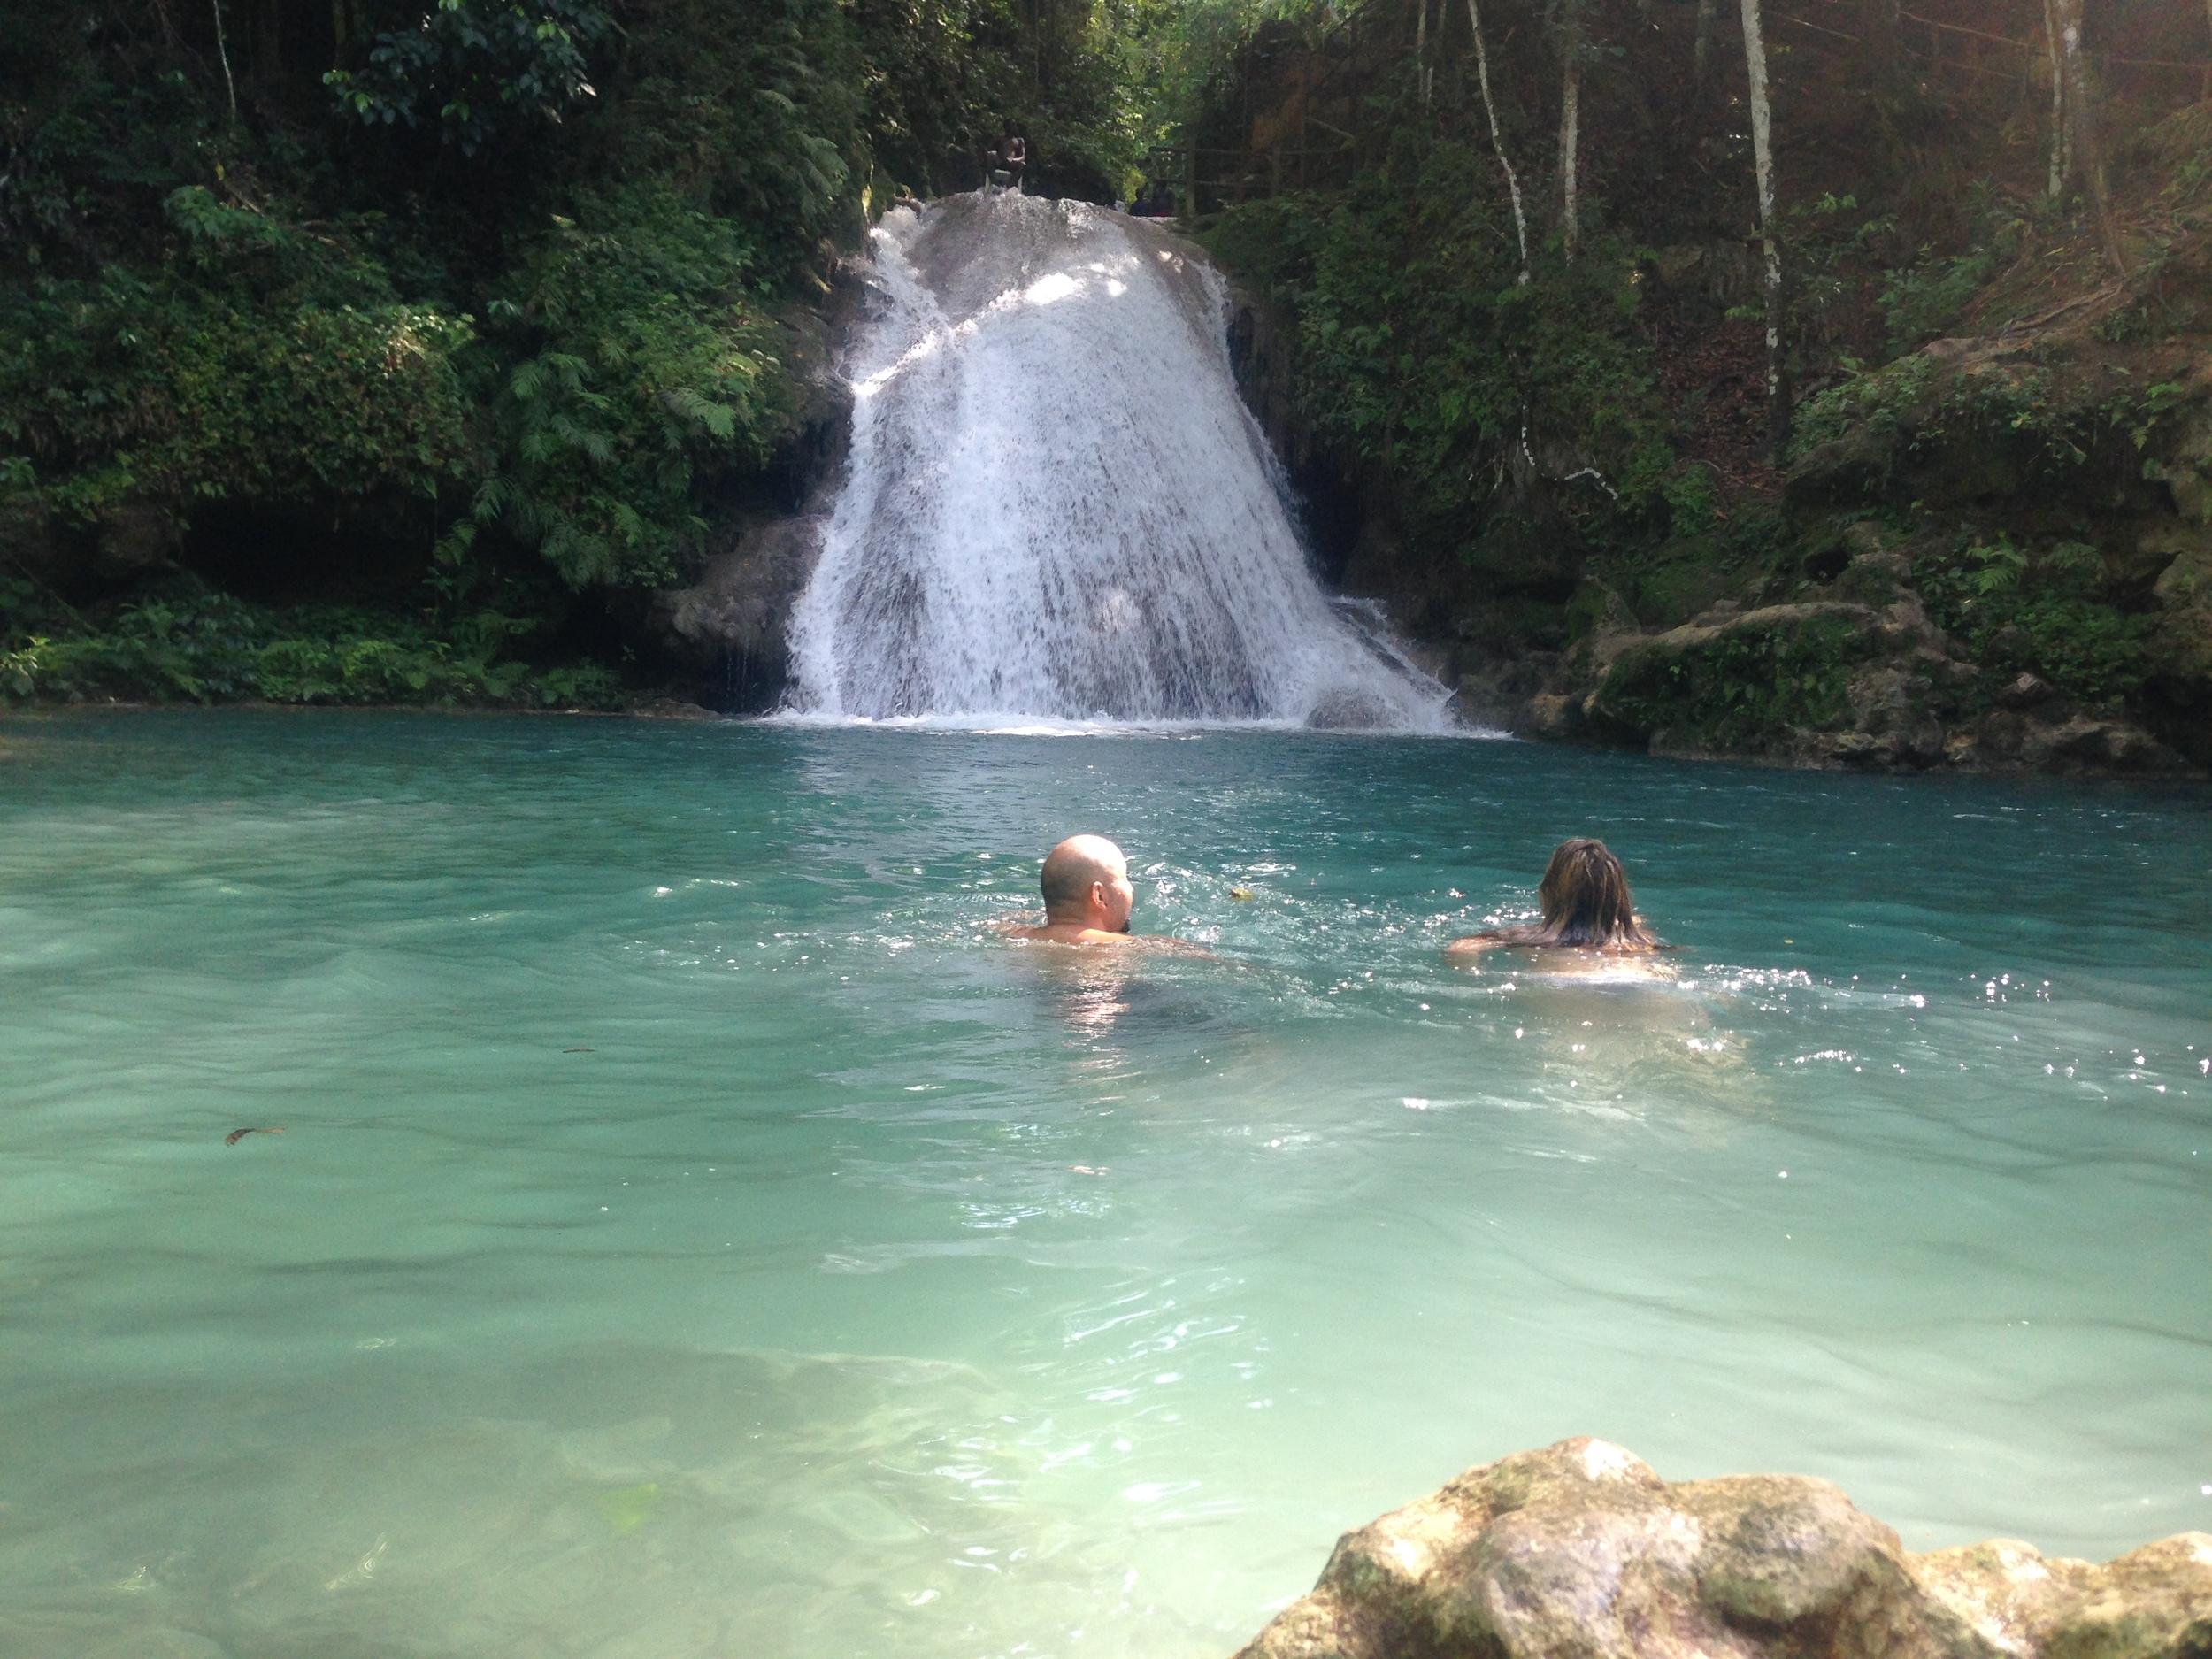 Ocho Rios, Jamaica. The Blue hole.